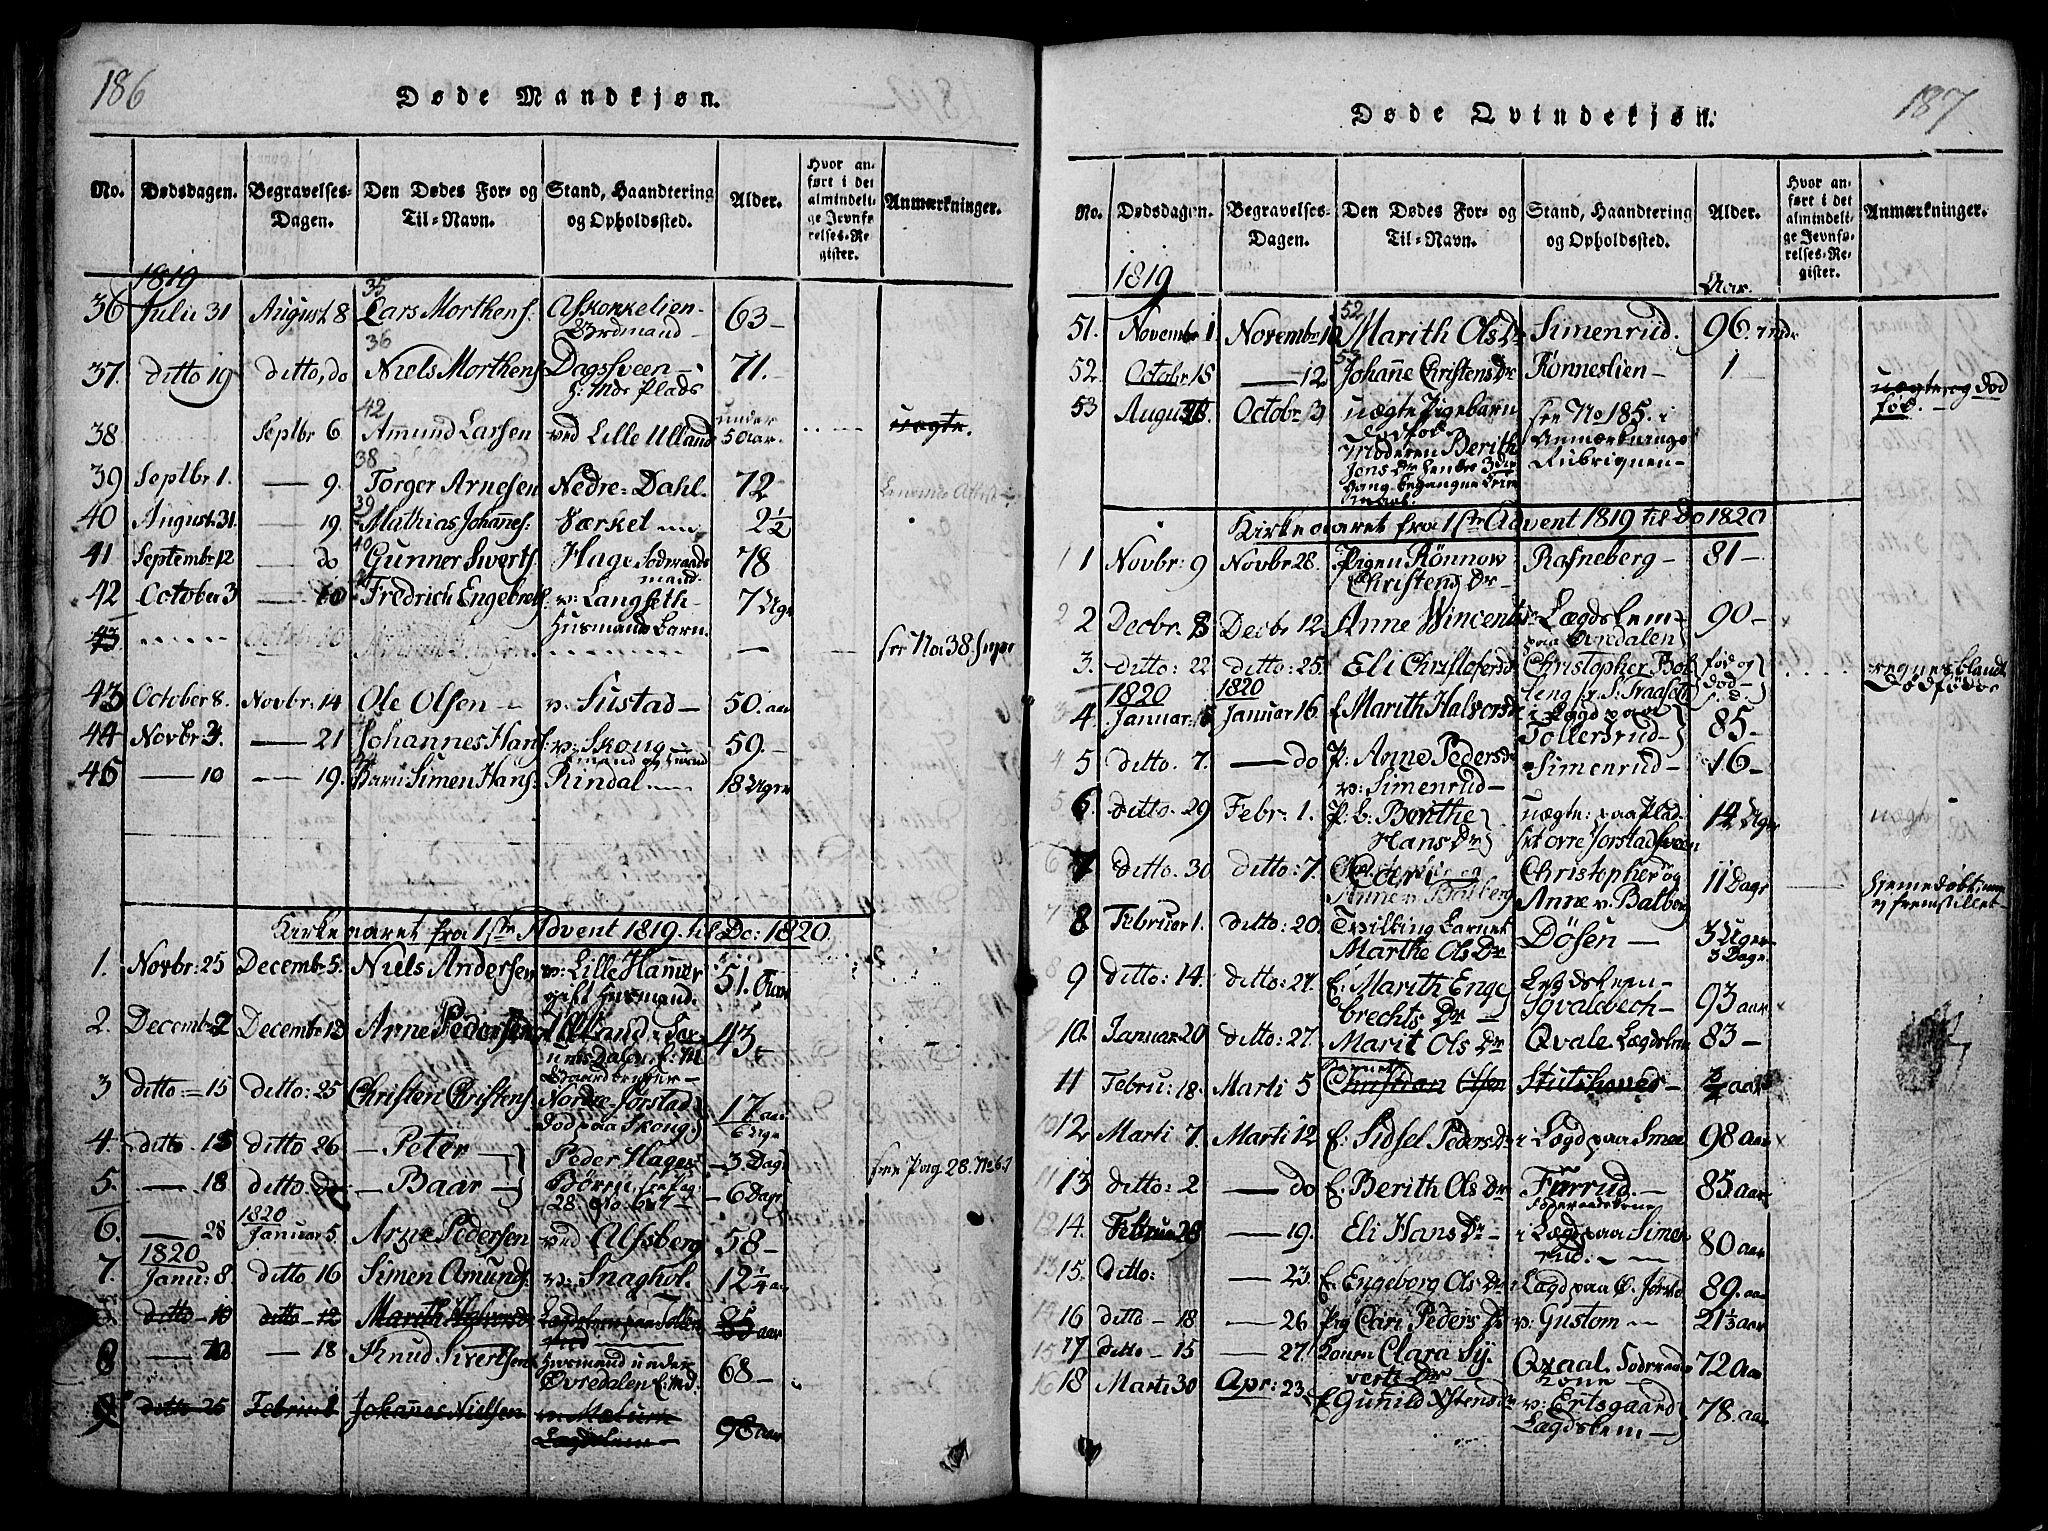 SAH, Fåberg prestekontor, Ministerialbok nr. 3, 1818-1833, s. 186-187